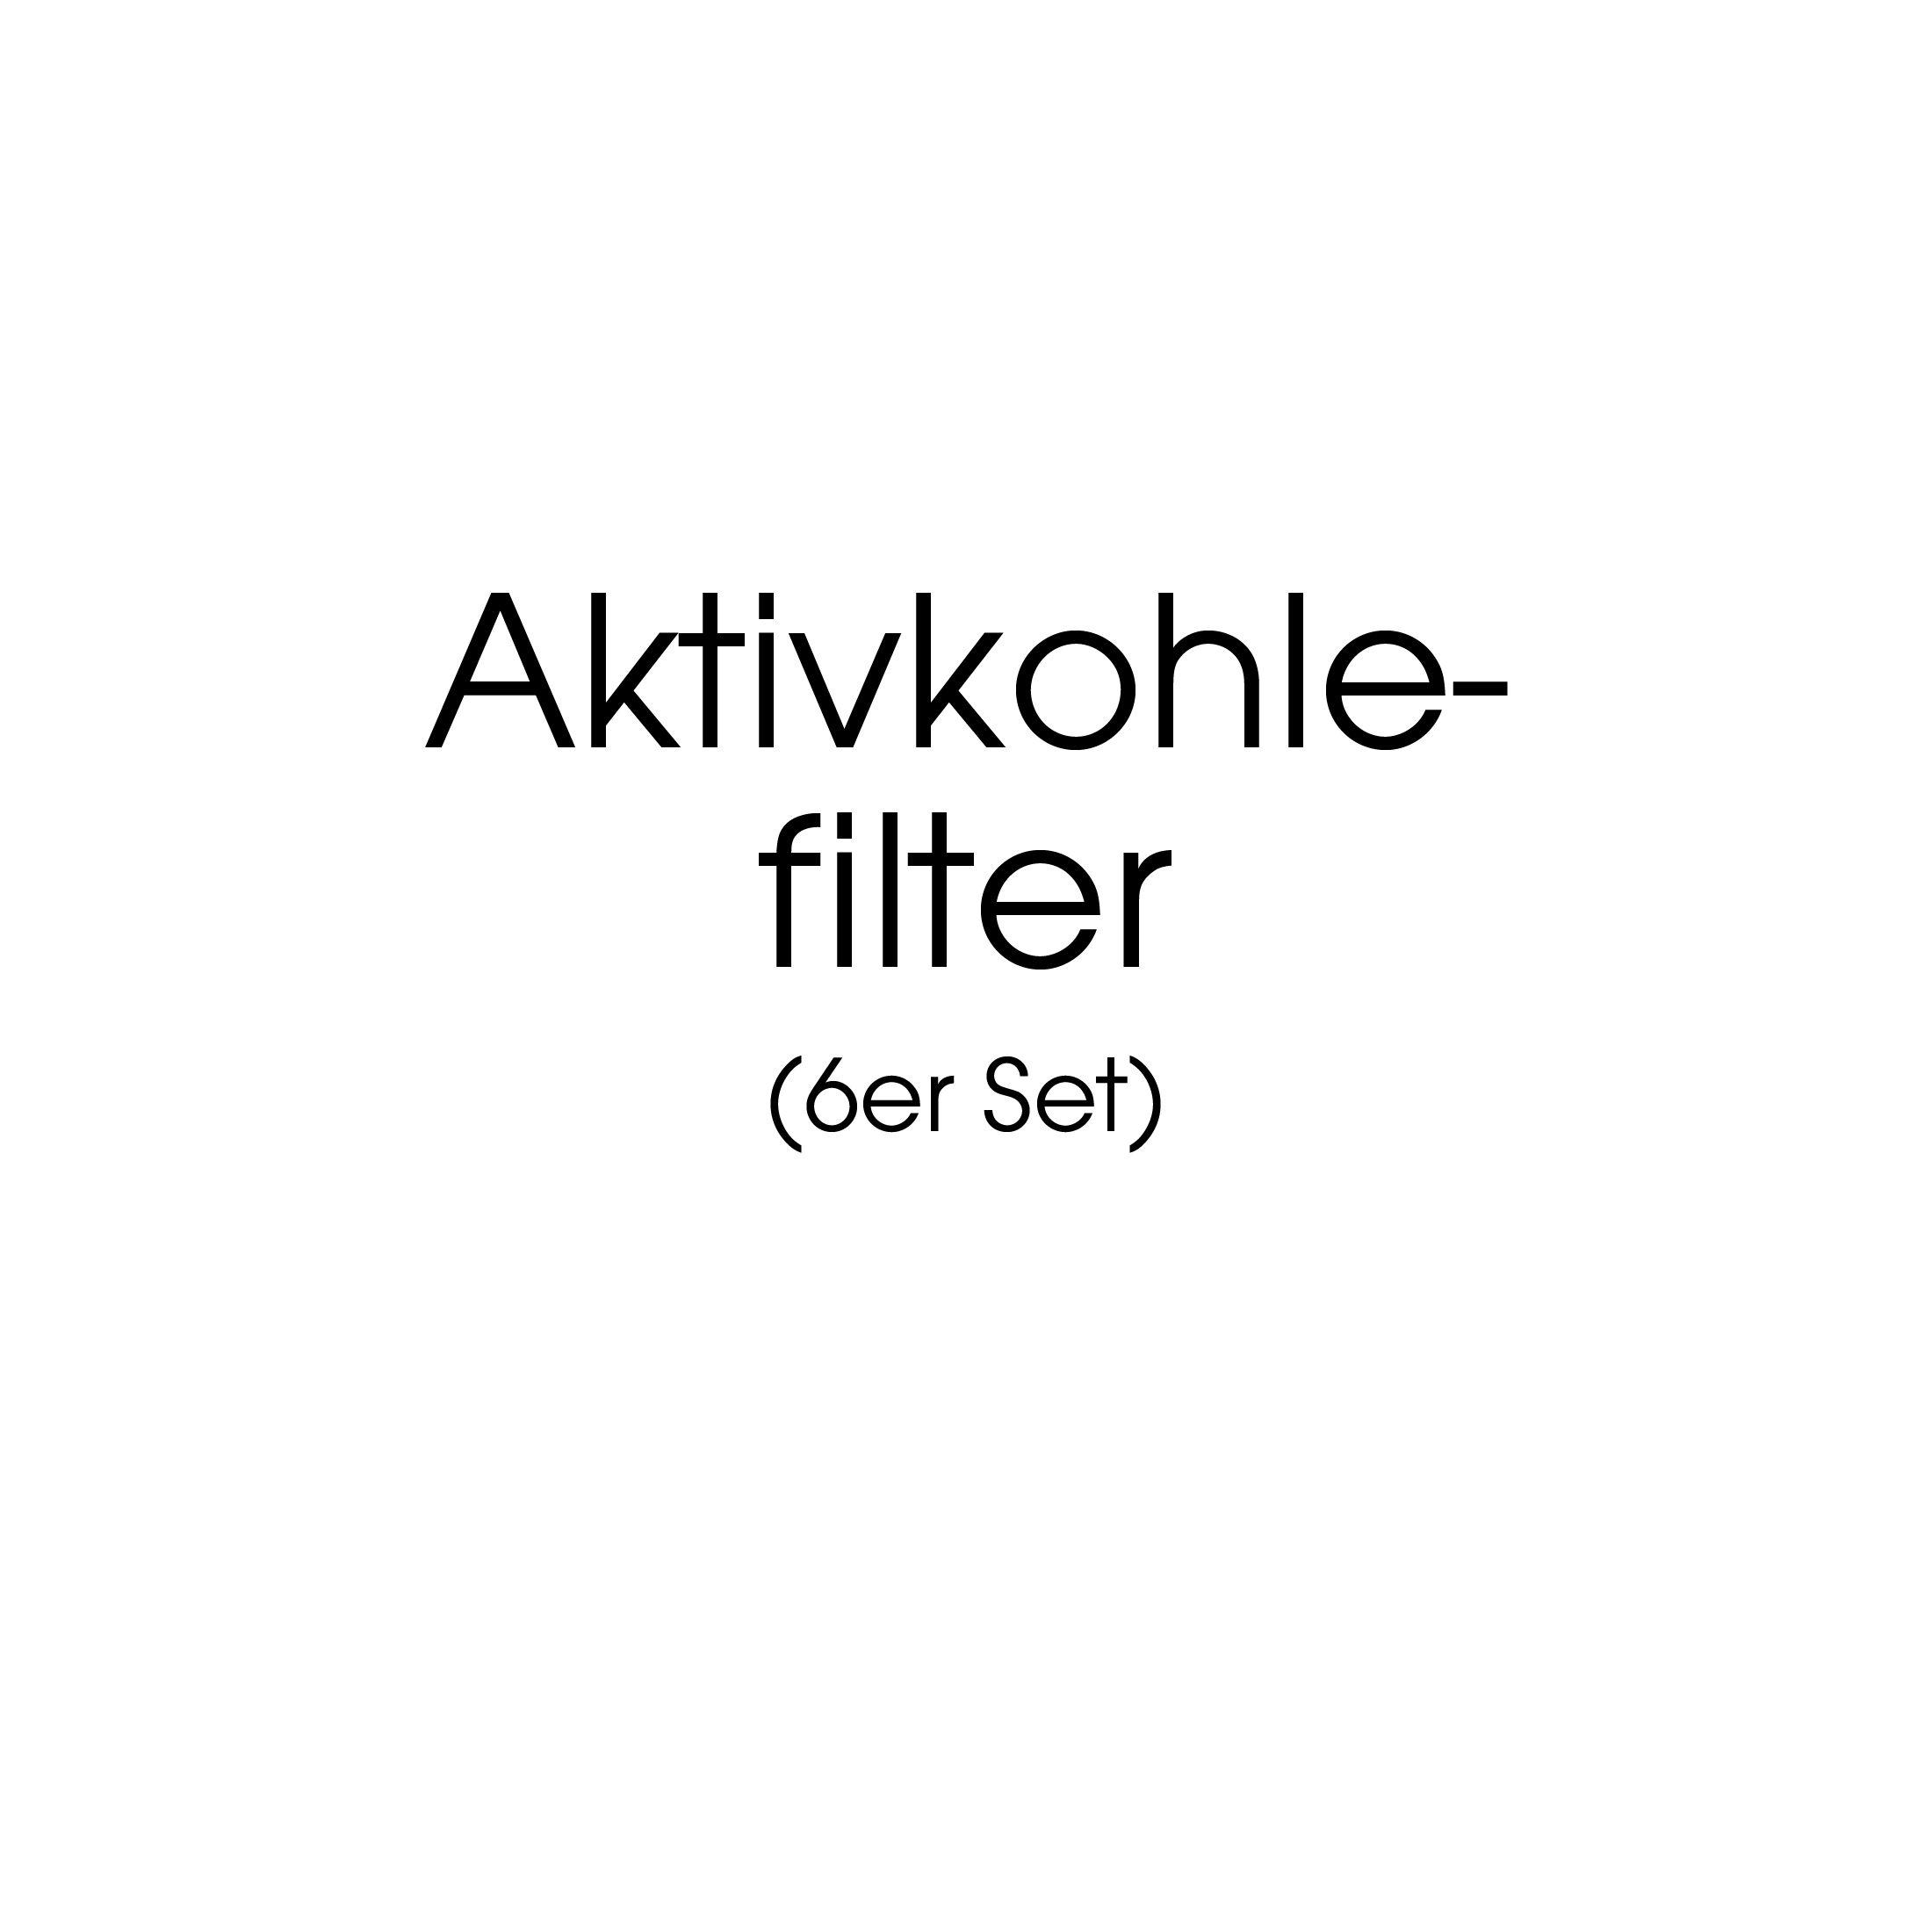 Aktivkohle Filter, 6er-Set, f. Weinkühlschränke WL450 F & DF